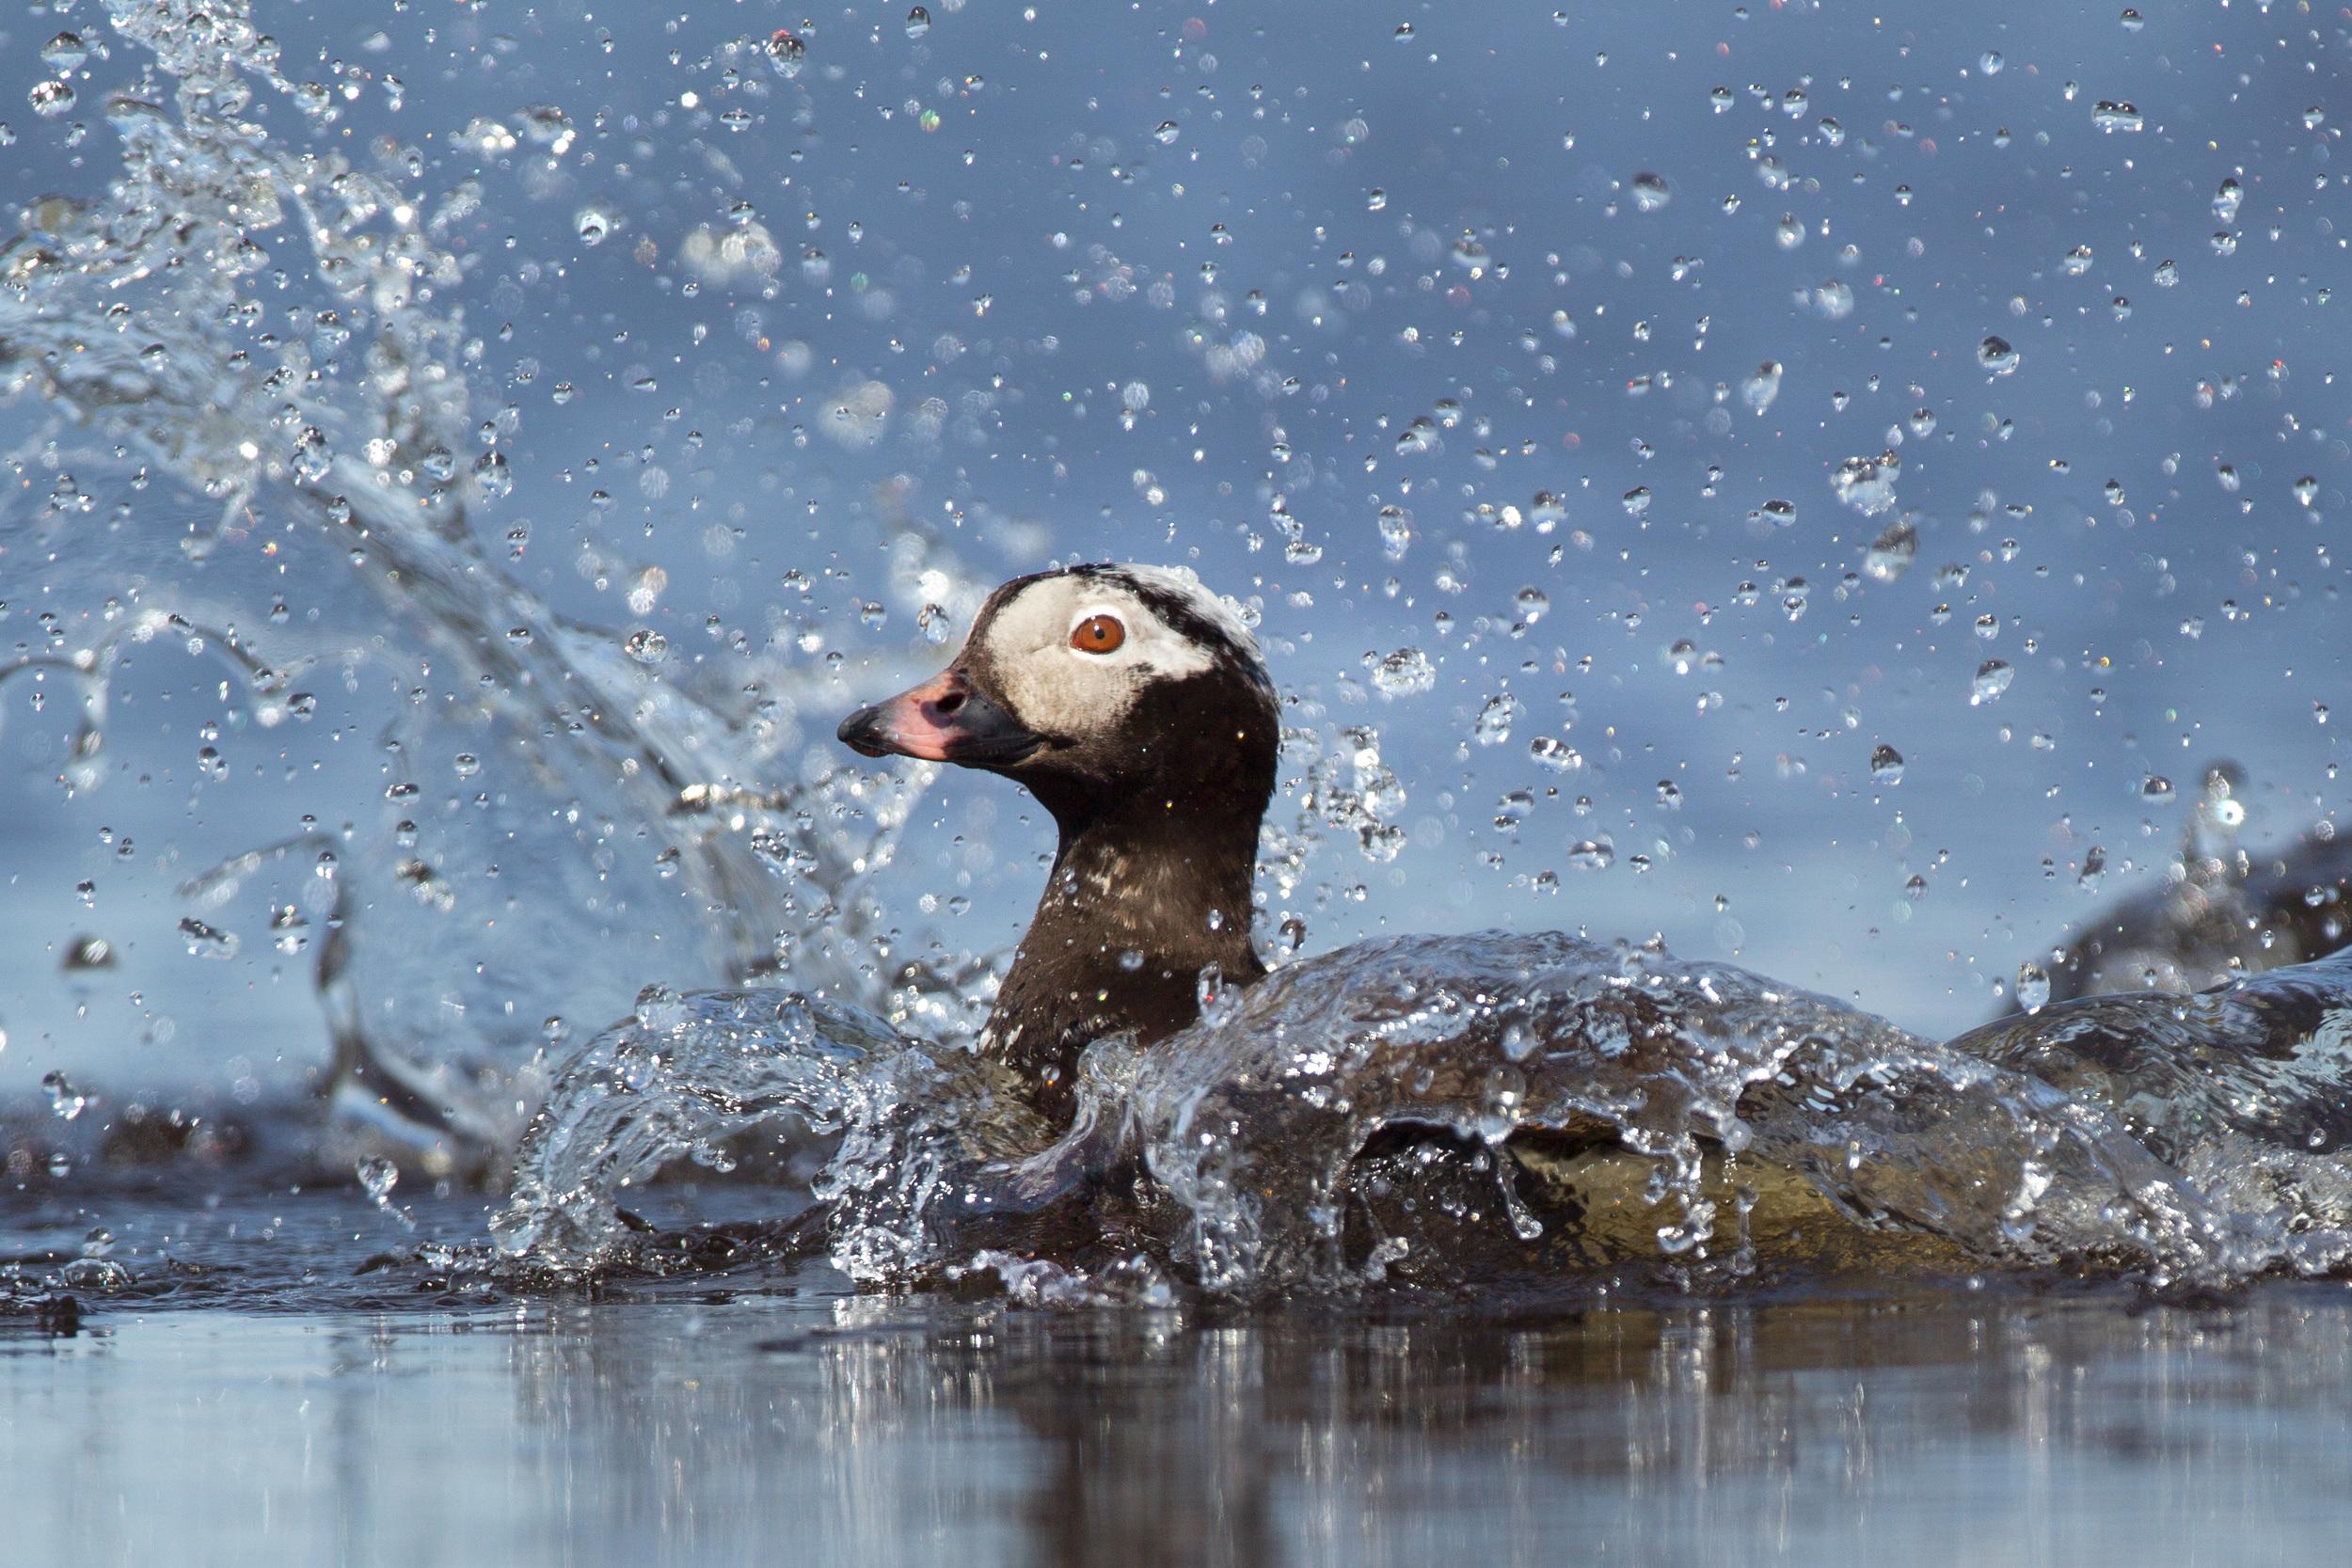 long-tailed_duck_0040000b.jpg